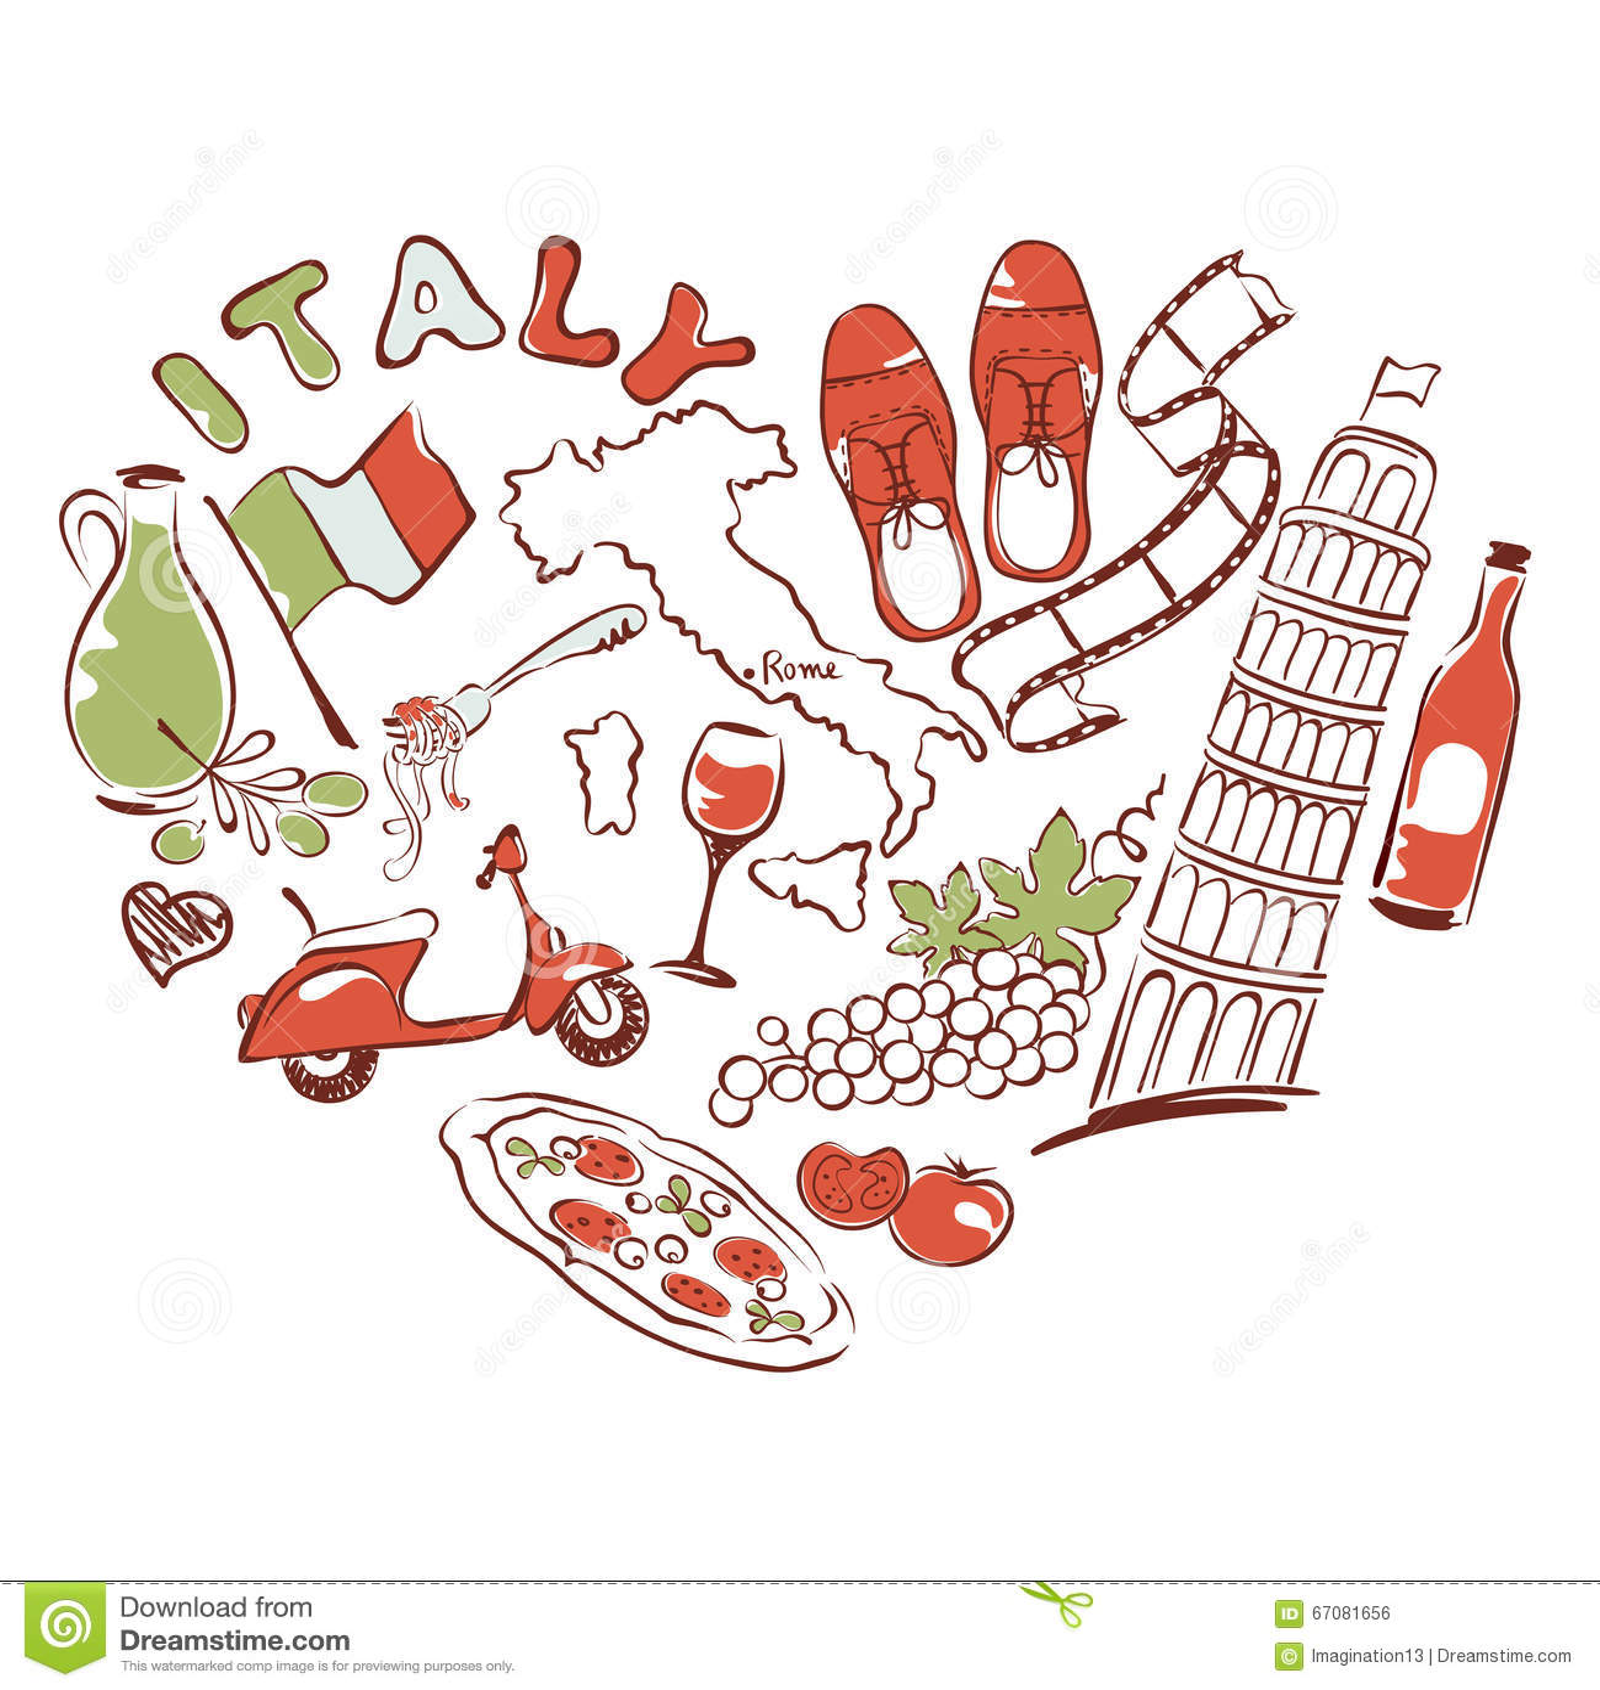 Très J'aime L'Italie Coeur De Symbole Des Attractions De L'Italie  RO23